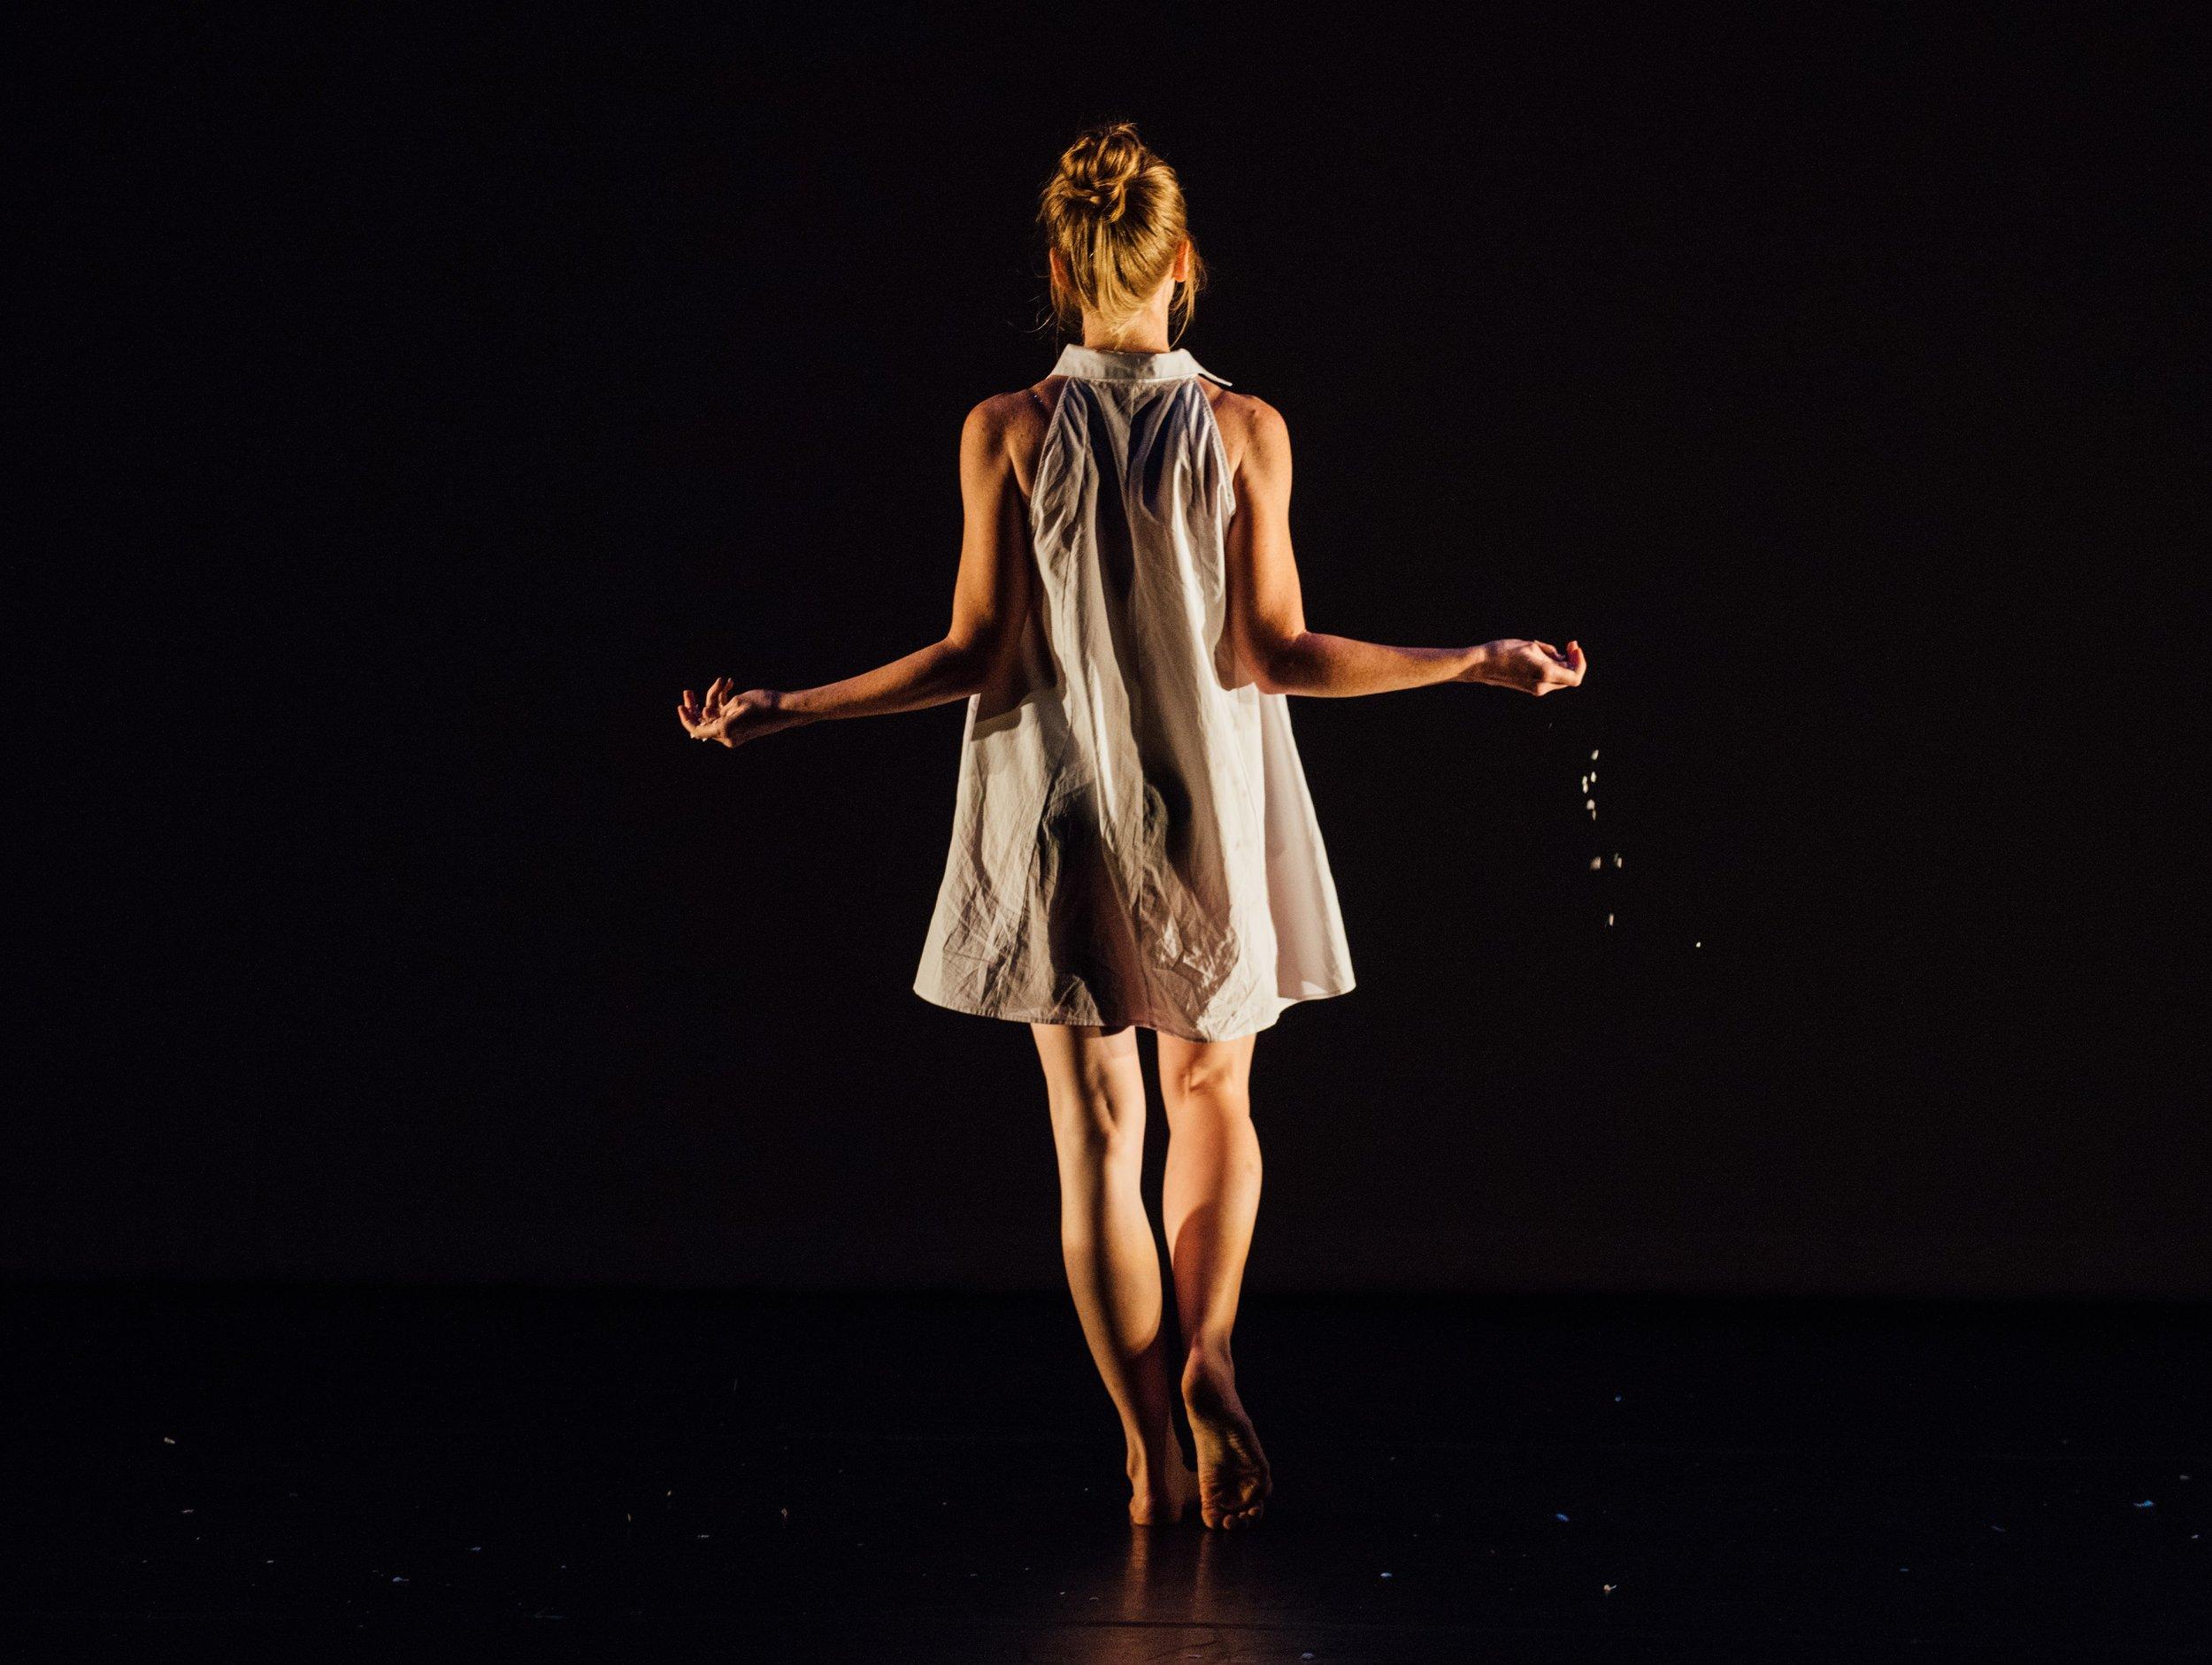 Sea of Senses - Choreographer: Paige Krause - Part of STIR (2017) - photo credit Denny Culbert